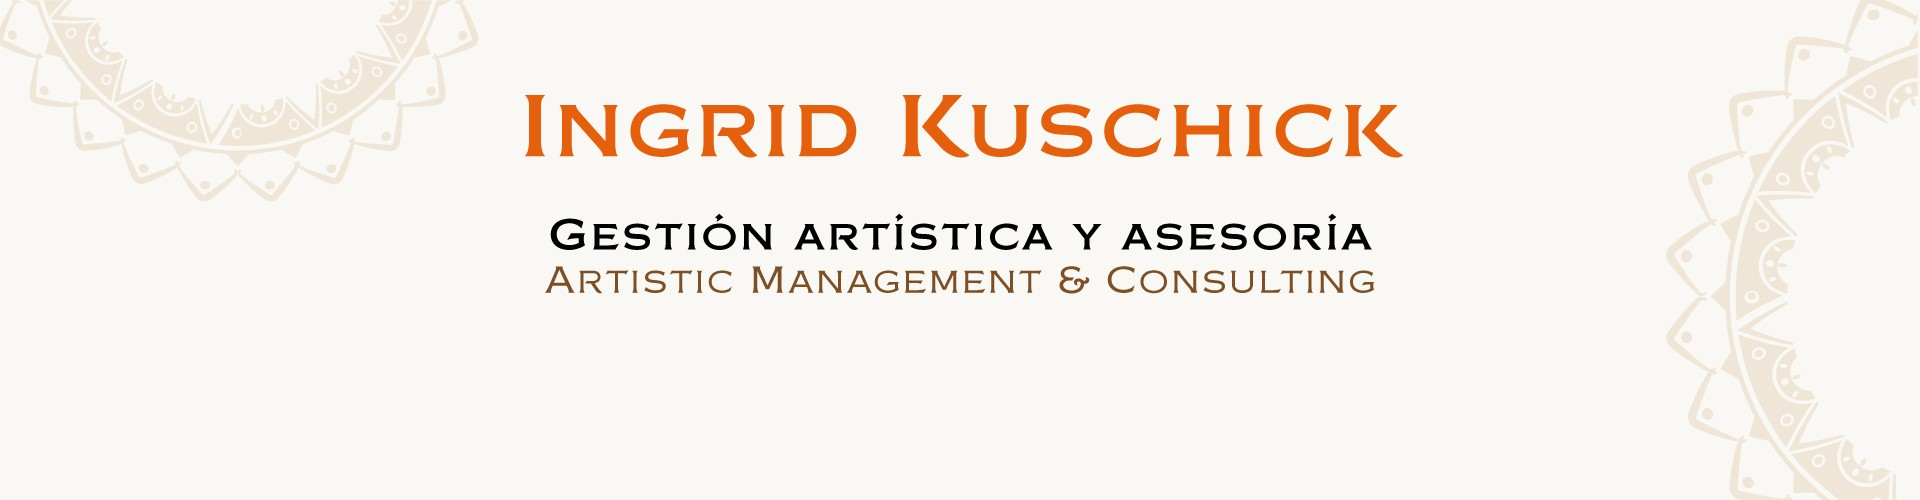 Ingrid Kuschick - Artistic management